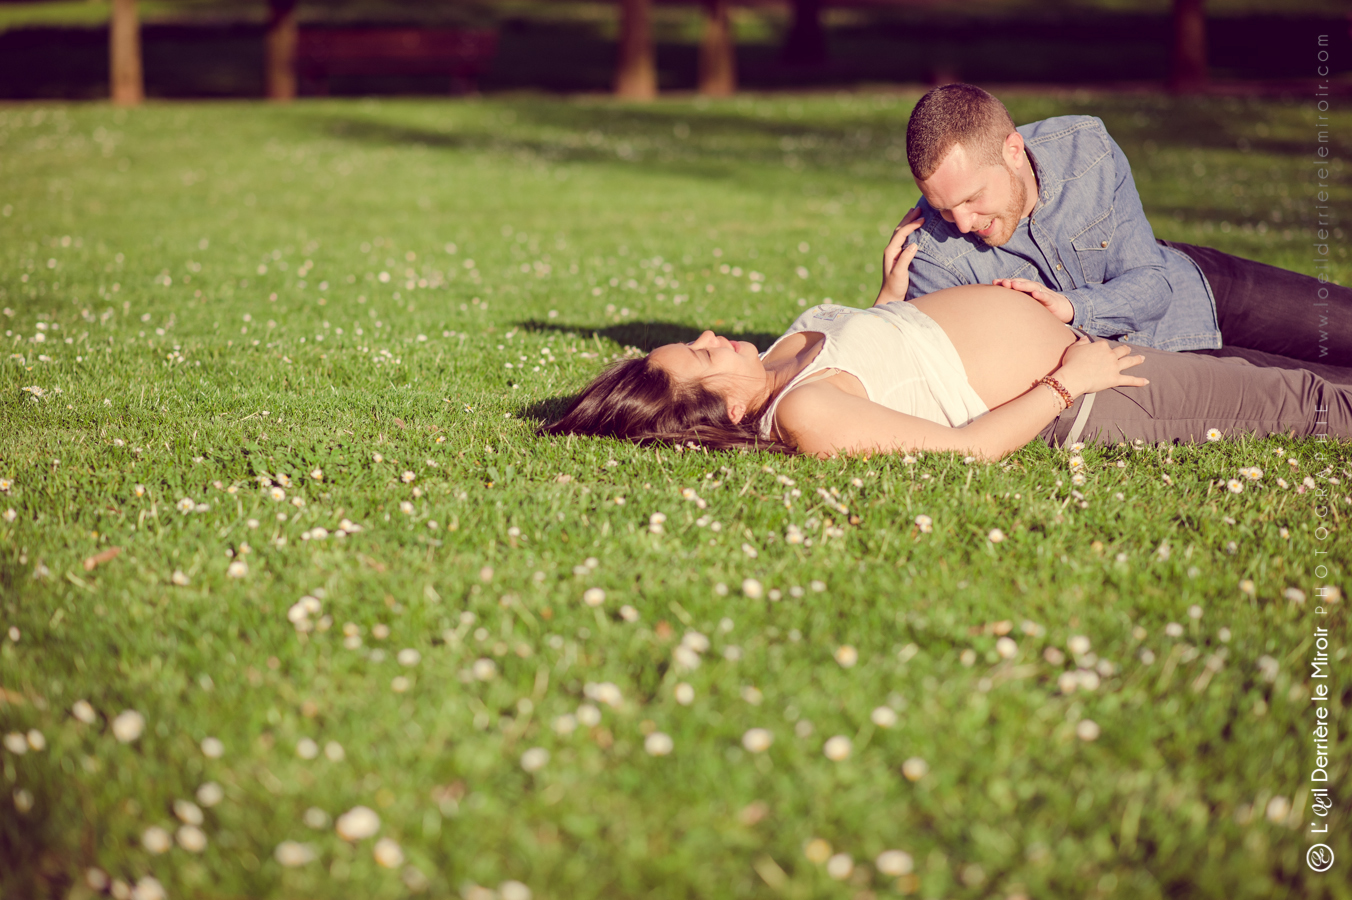 Photographe de grossesse 06 loeilderrierelemiroir